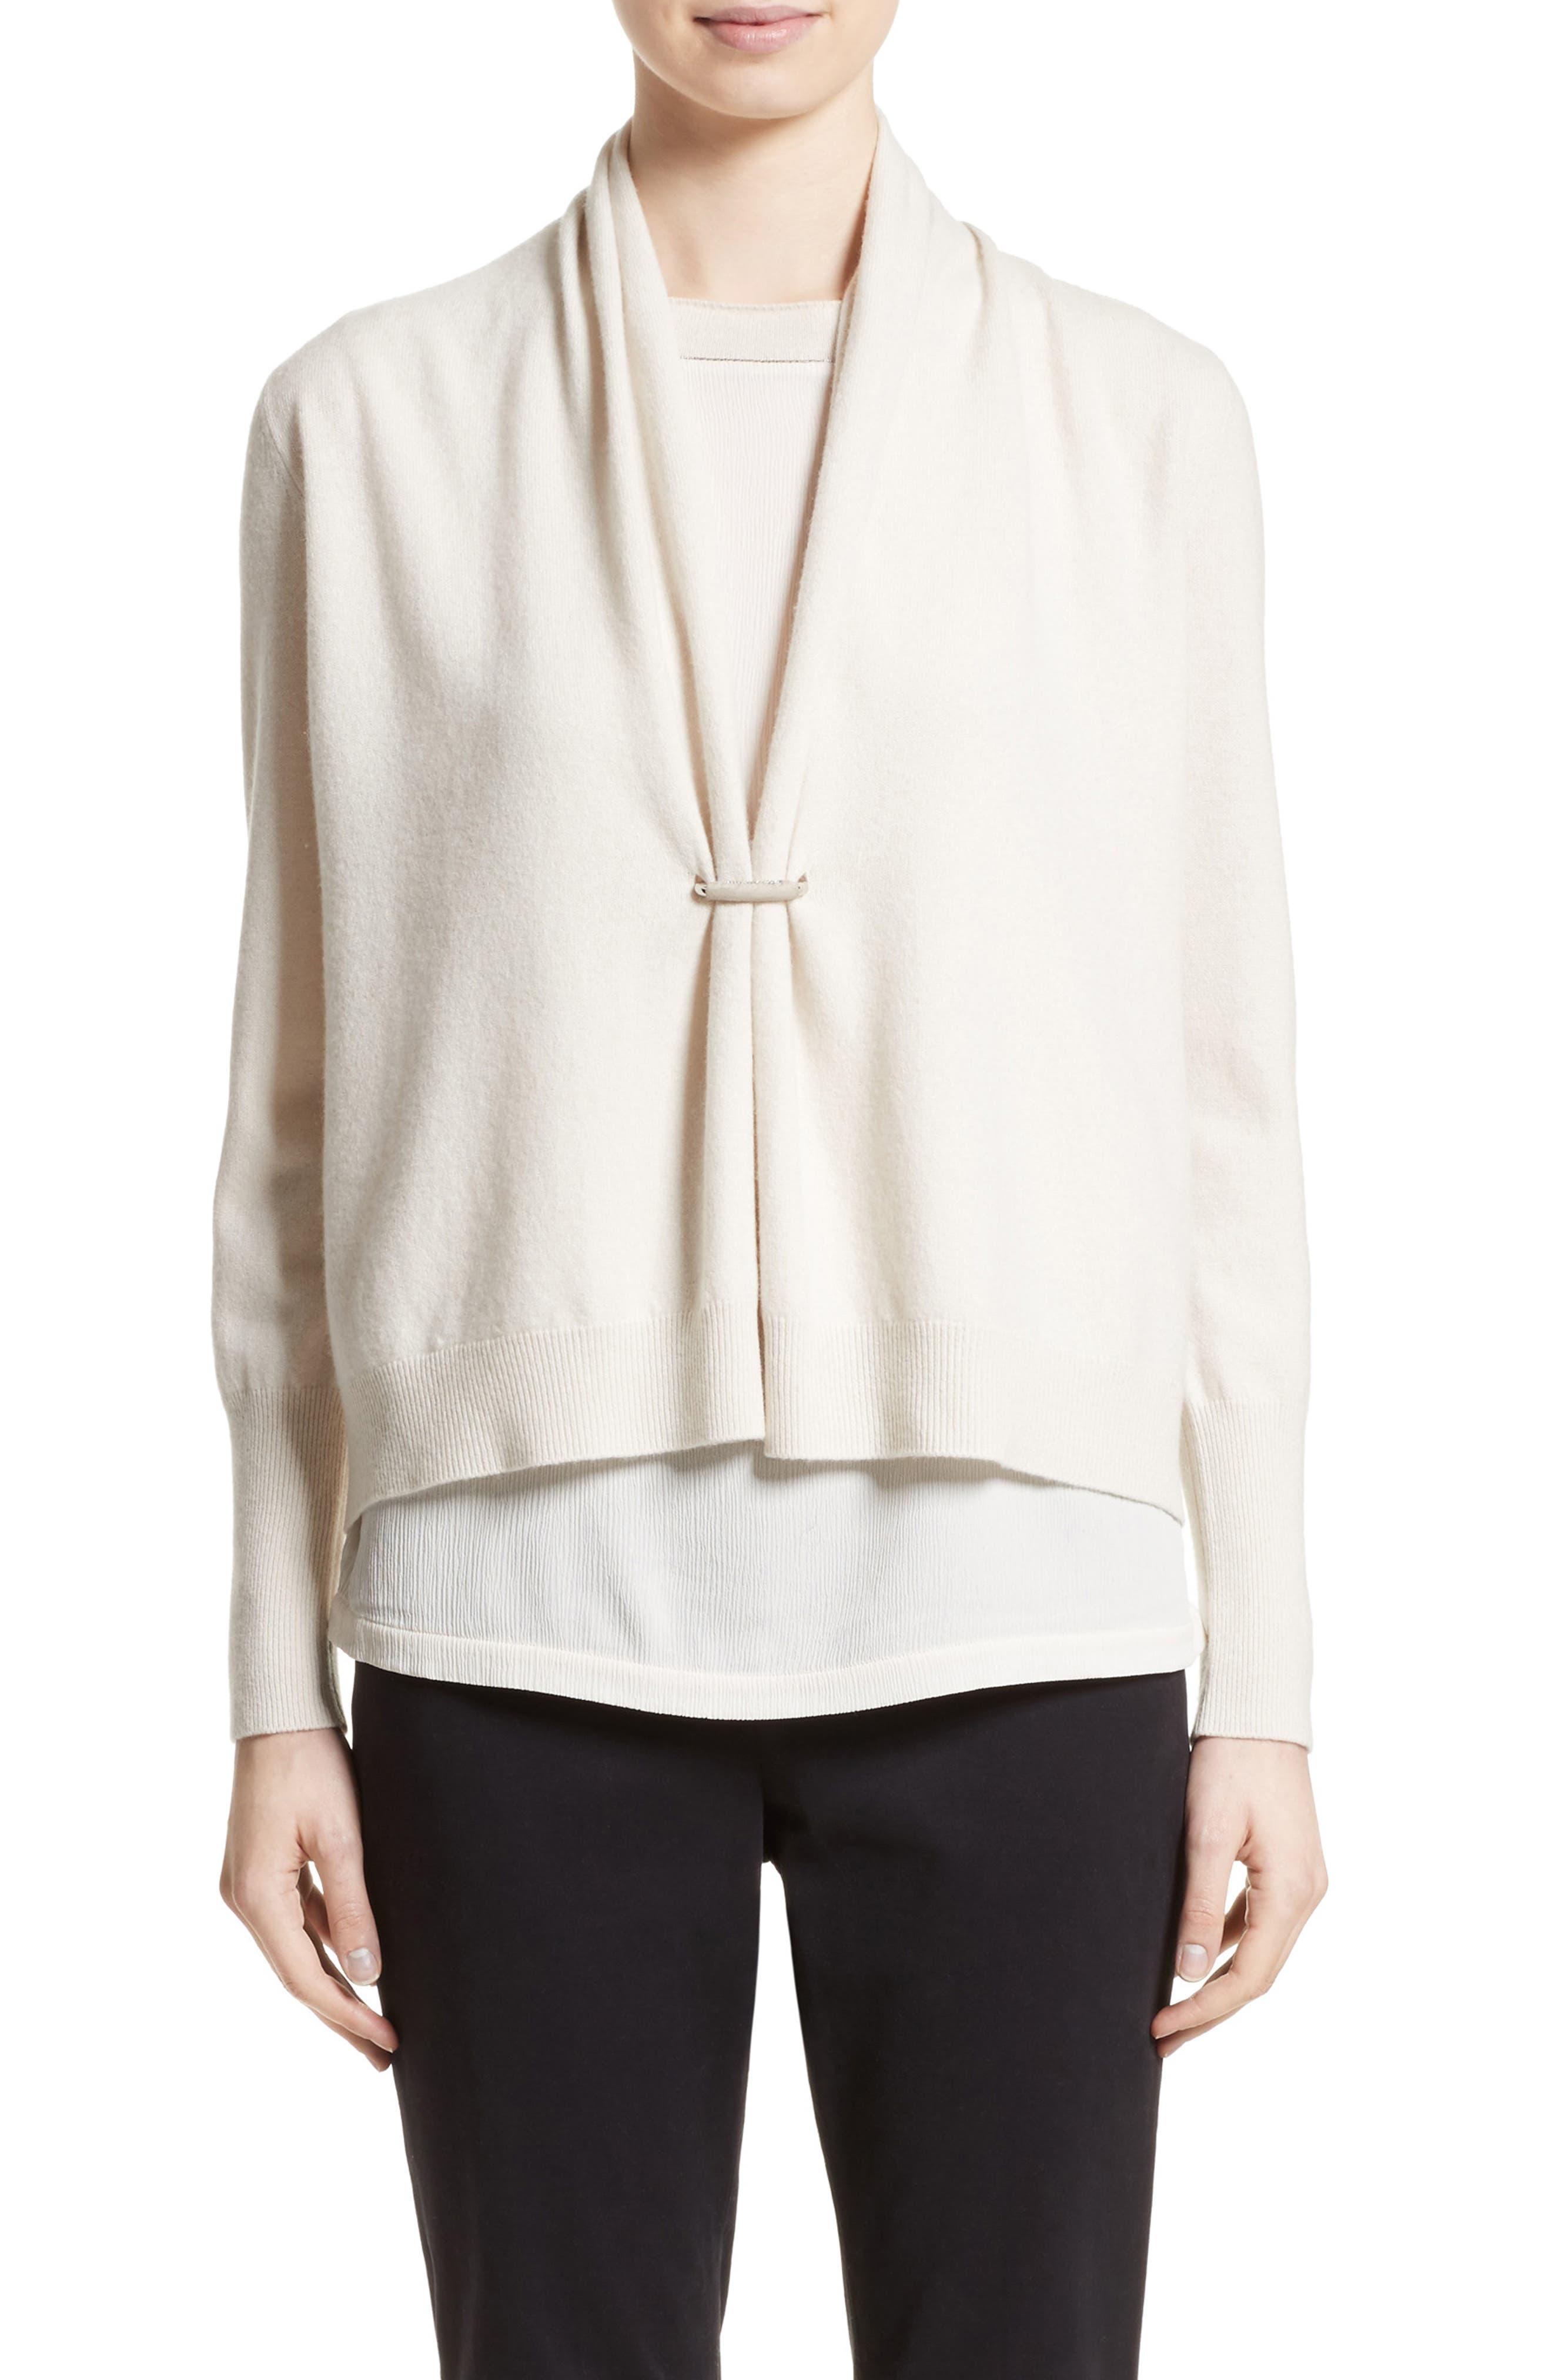 Alternate Image 1 Selected - Fabiana Filippi Wool, Silk & Cashmere Shawl Collar Cardigan